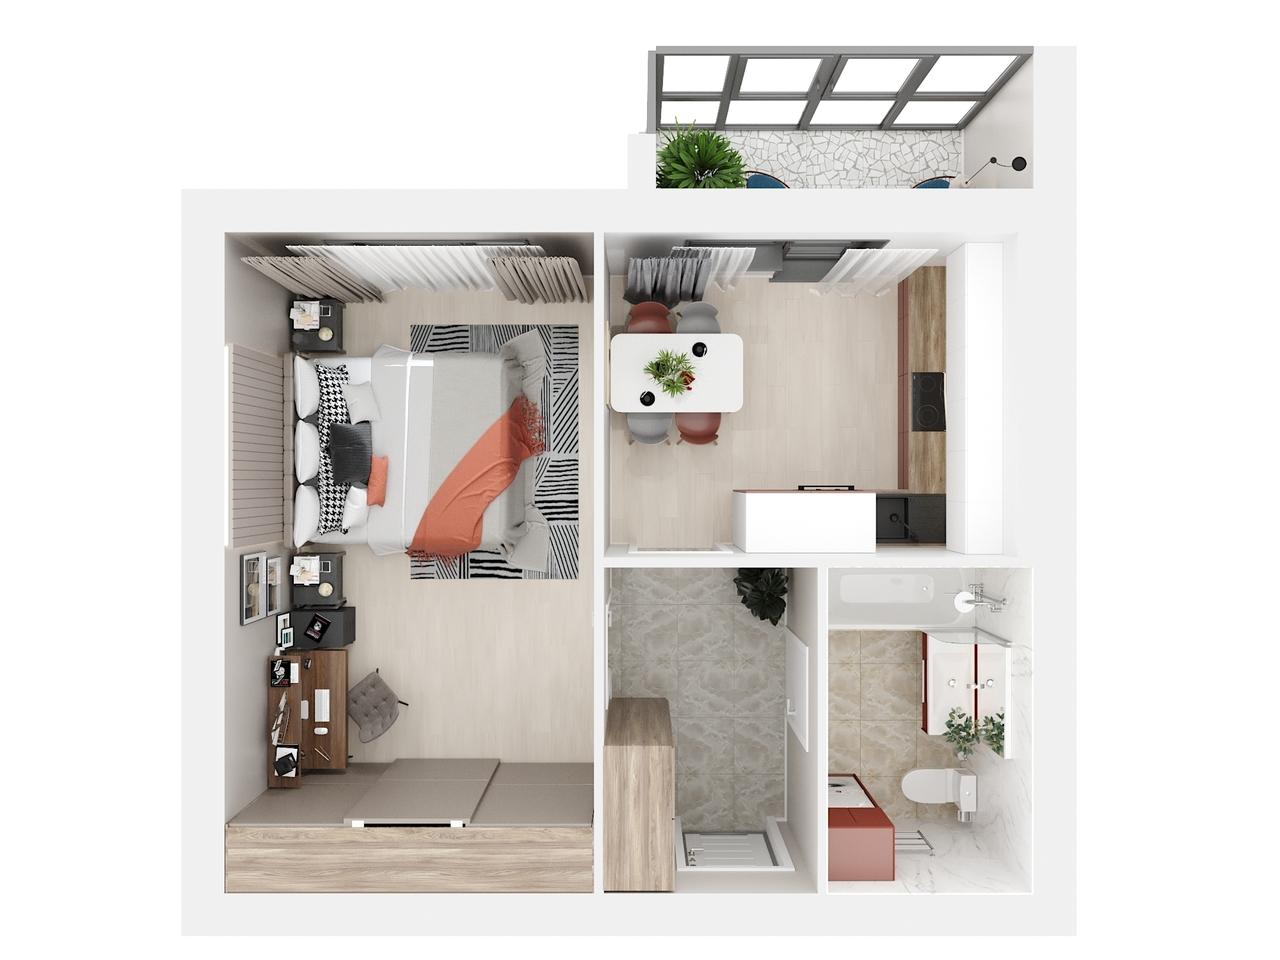 Дом 3 - 1-комнатная №21